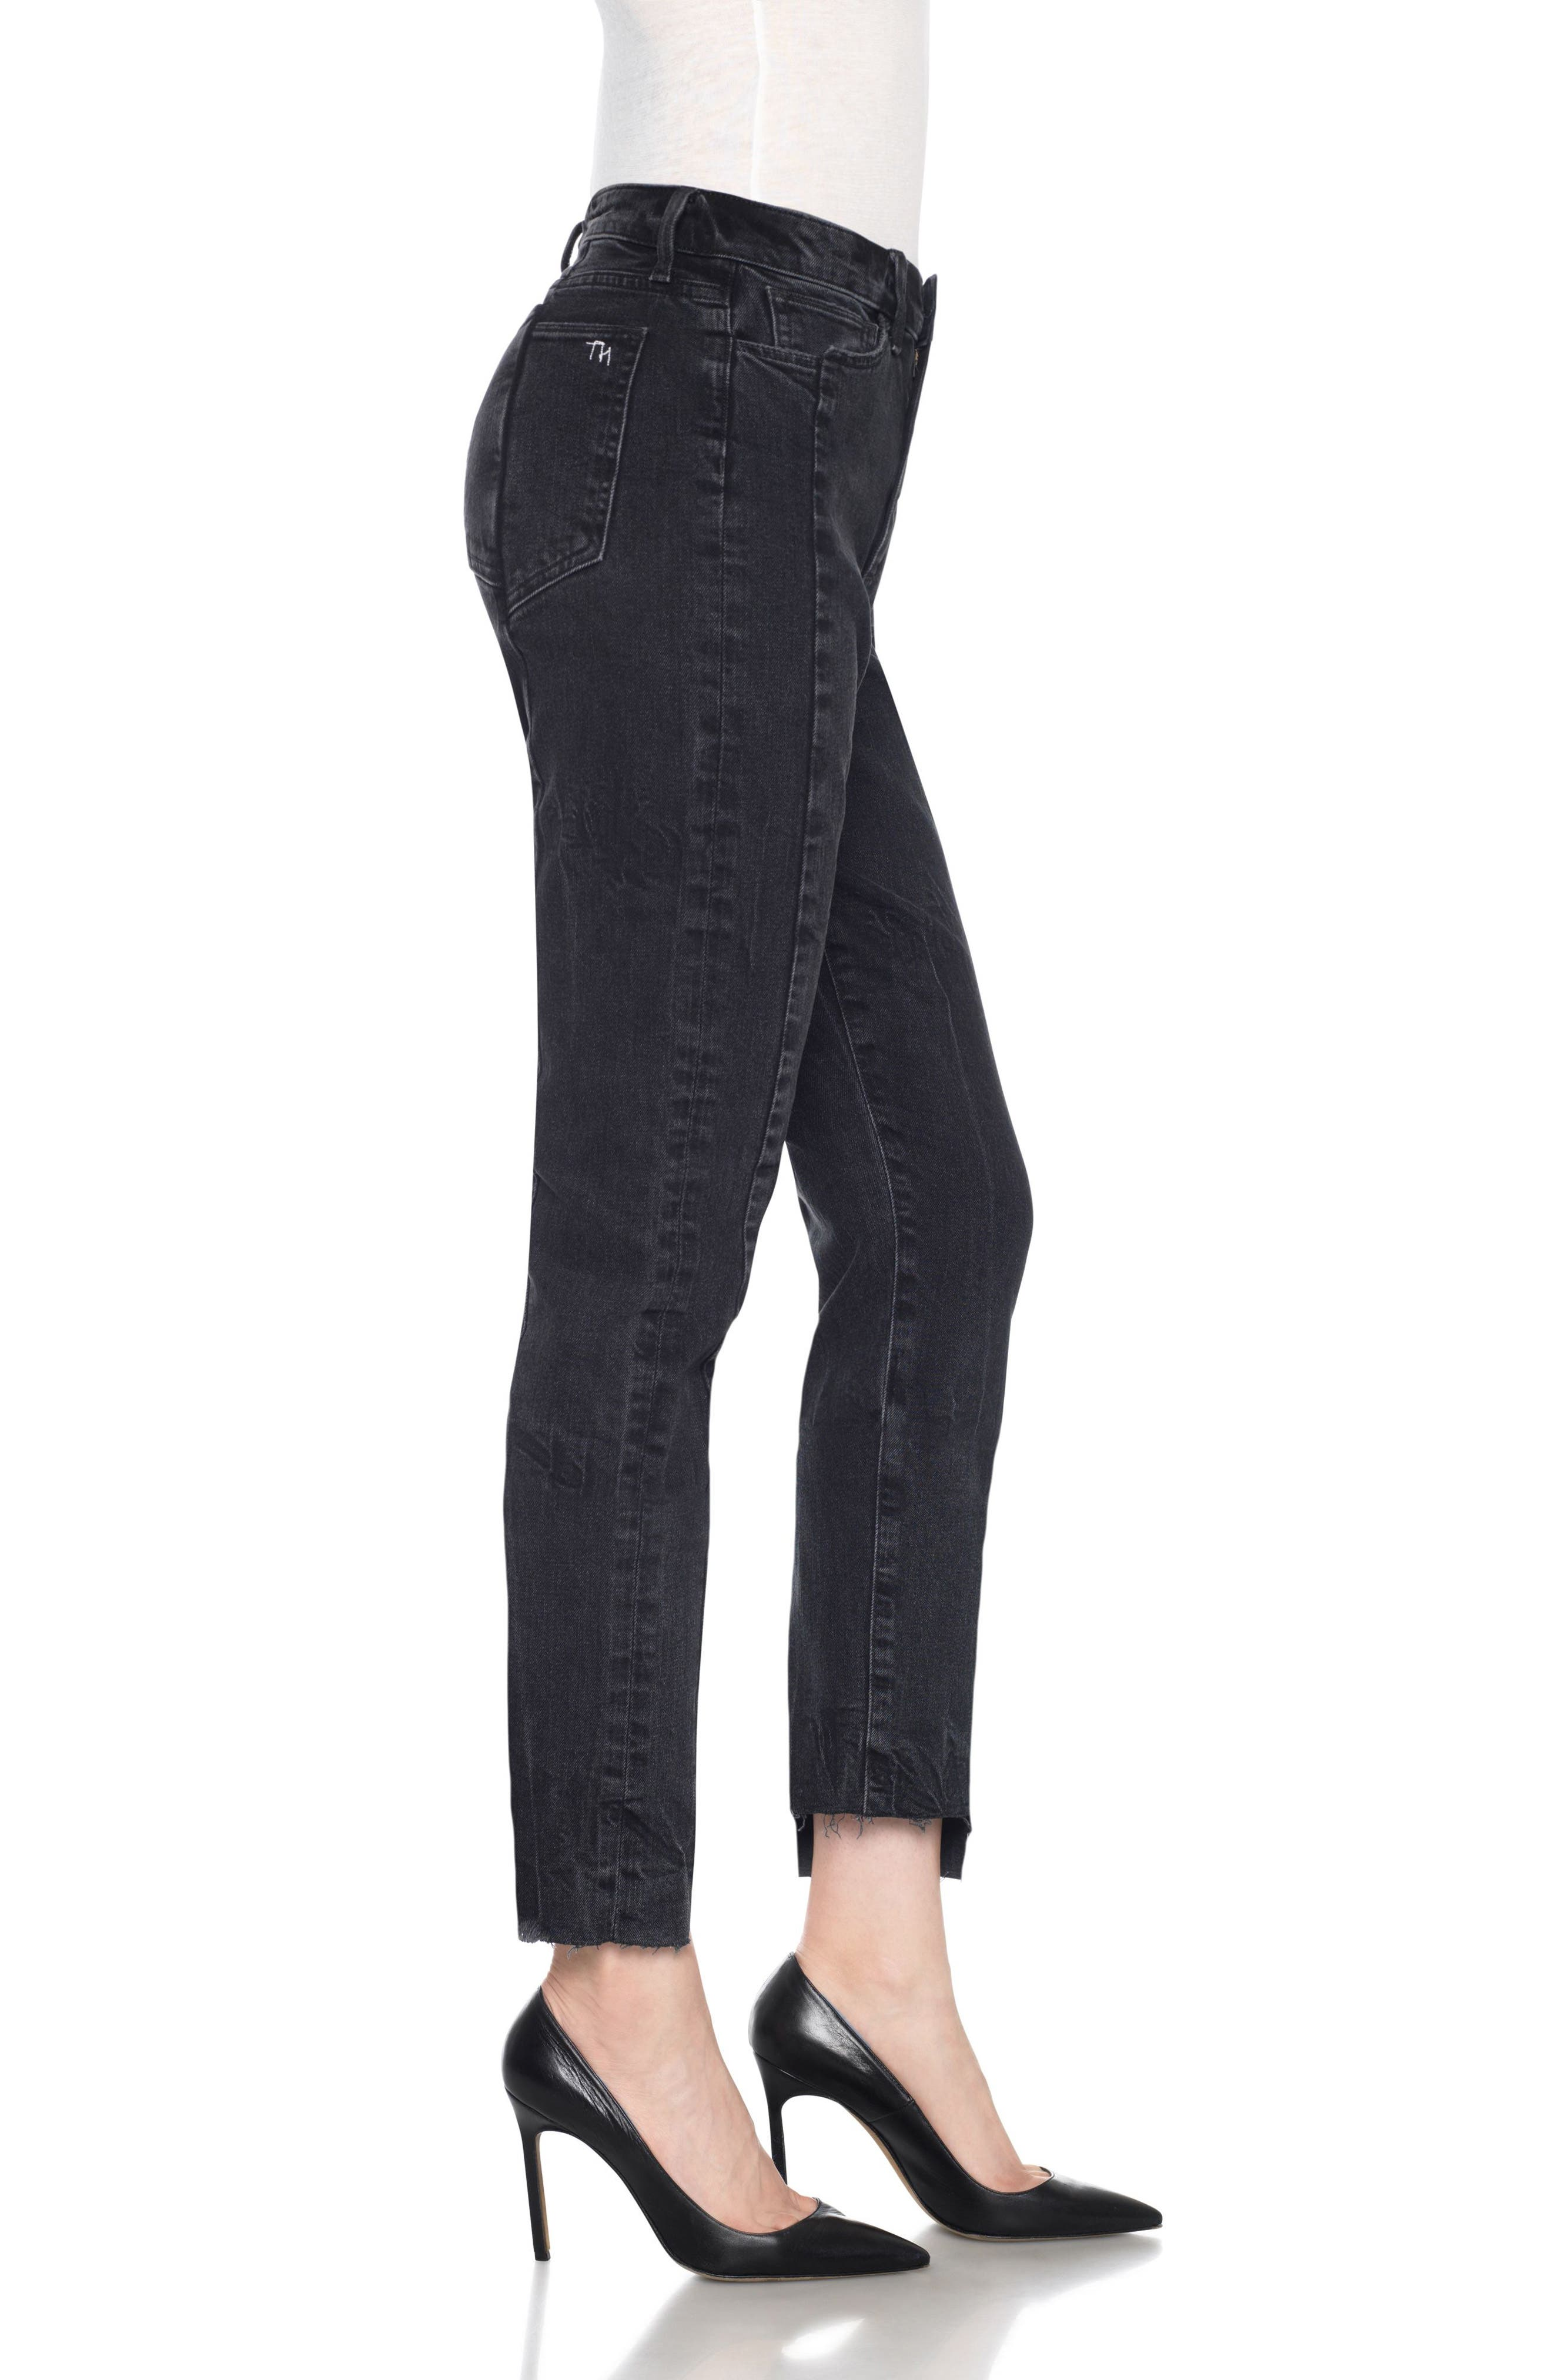 Taylor Hill x Joe's Kass Raw Step Hem Ankle Skinny Jeans,                             Alternate thumbnail 4, color,                             Domino